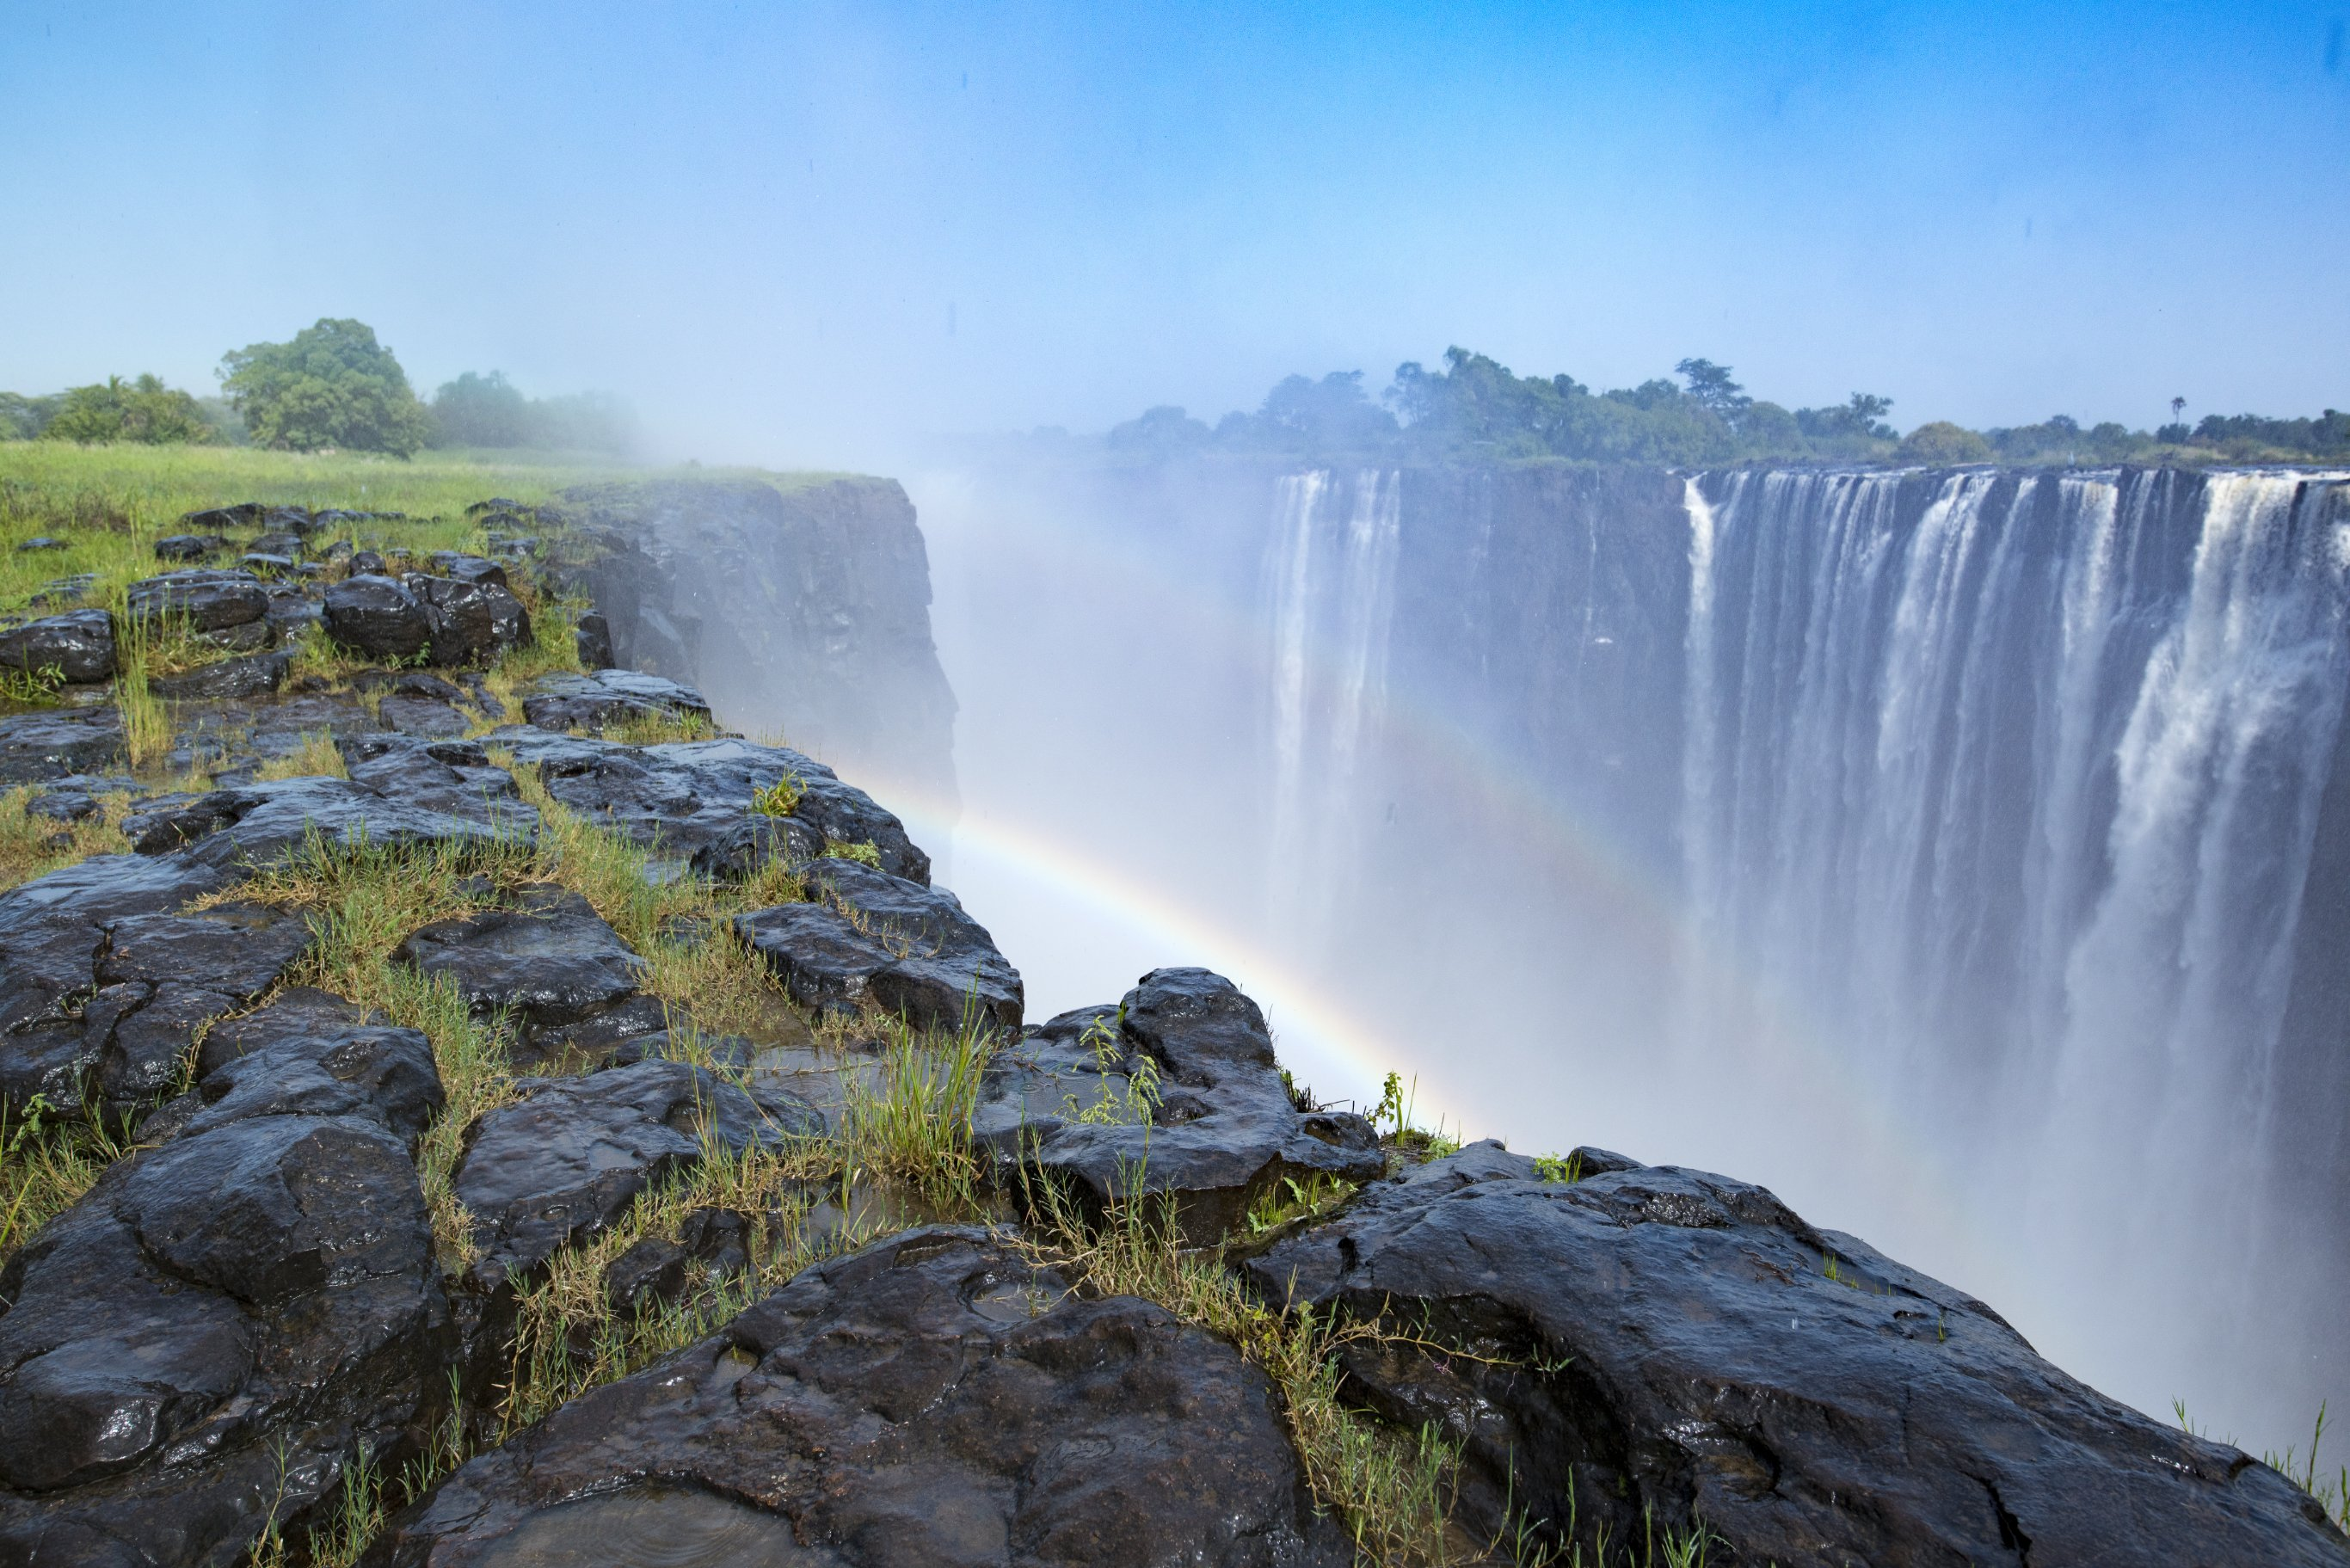 10-Day Zambia Adventure & Wildlife Safari - Zambia Itinerary